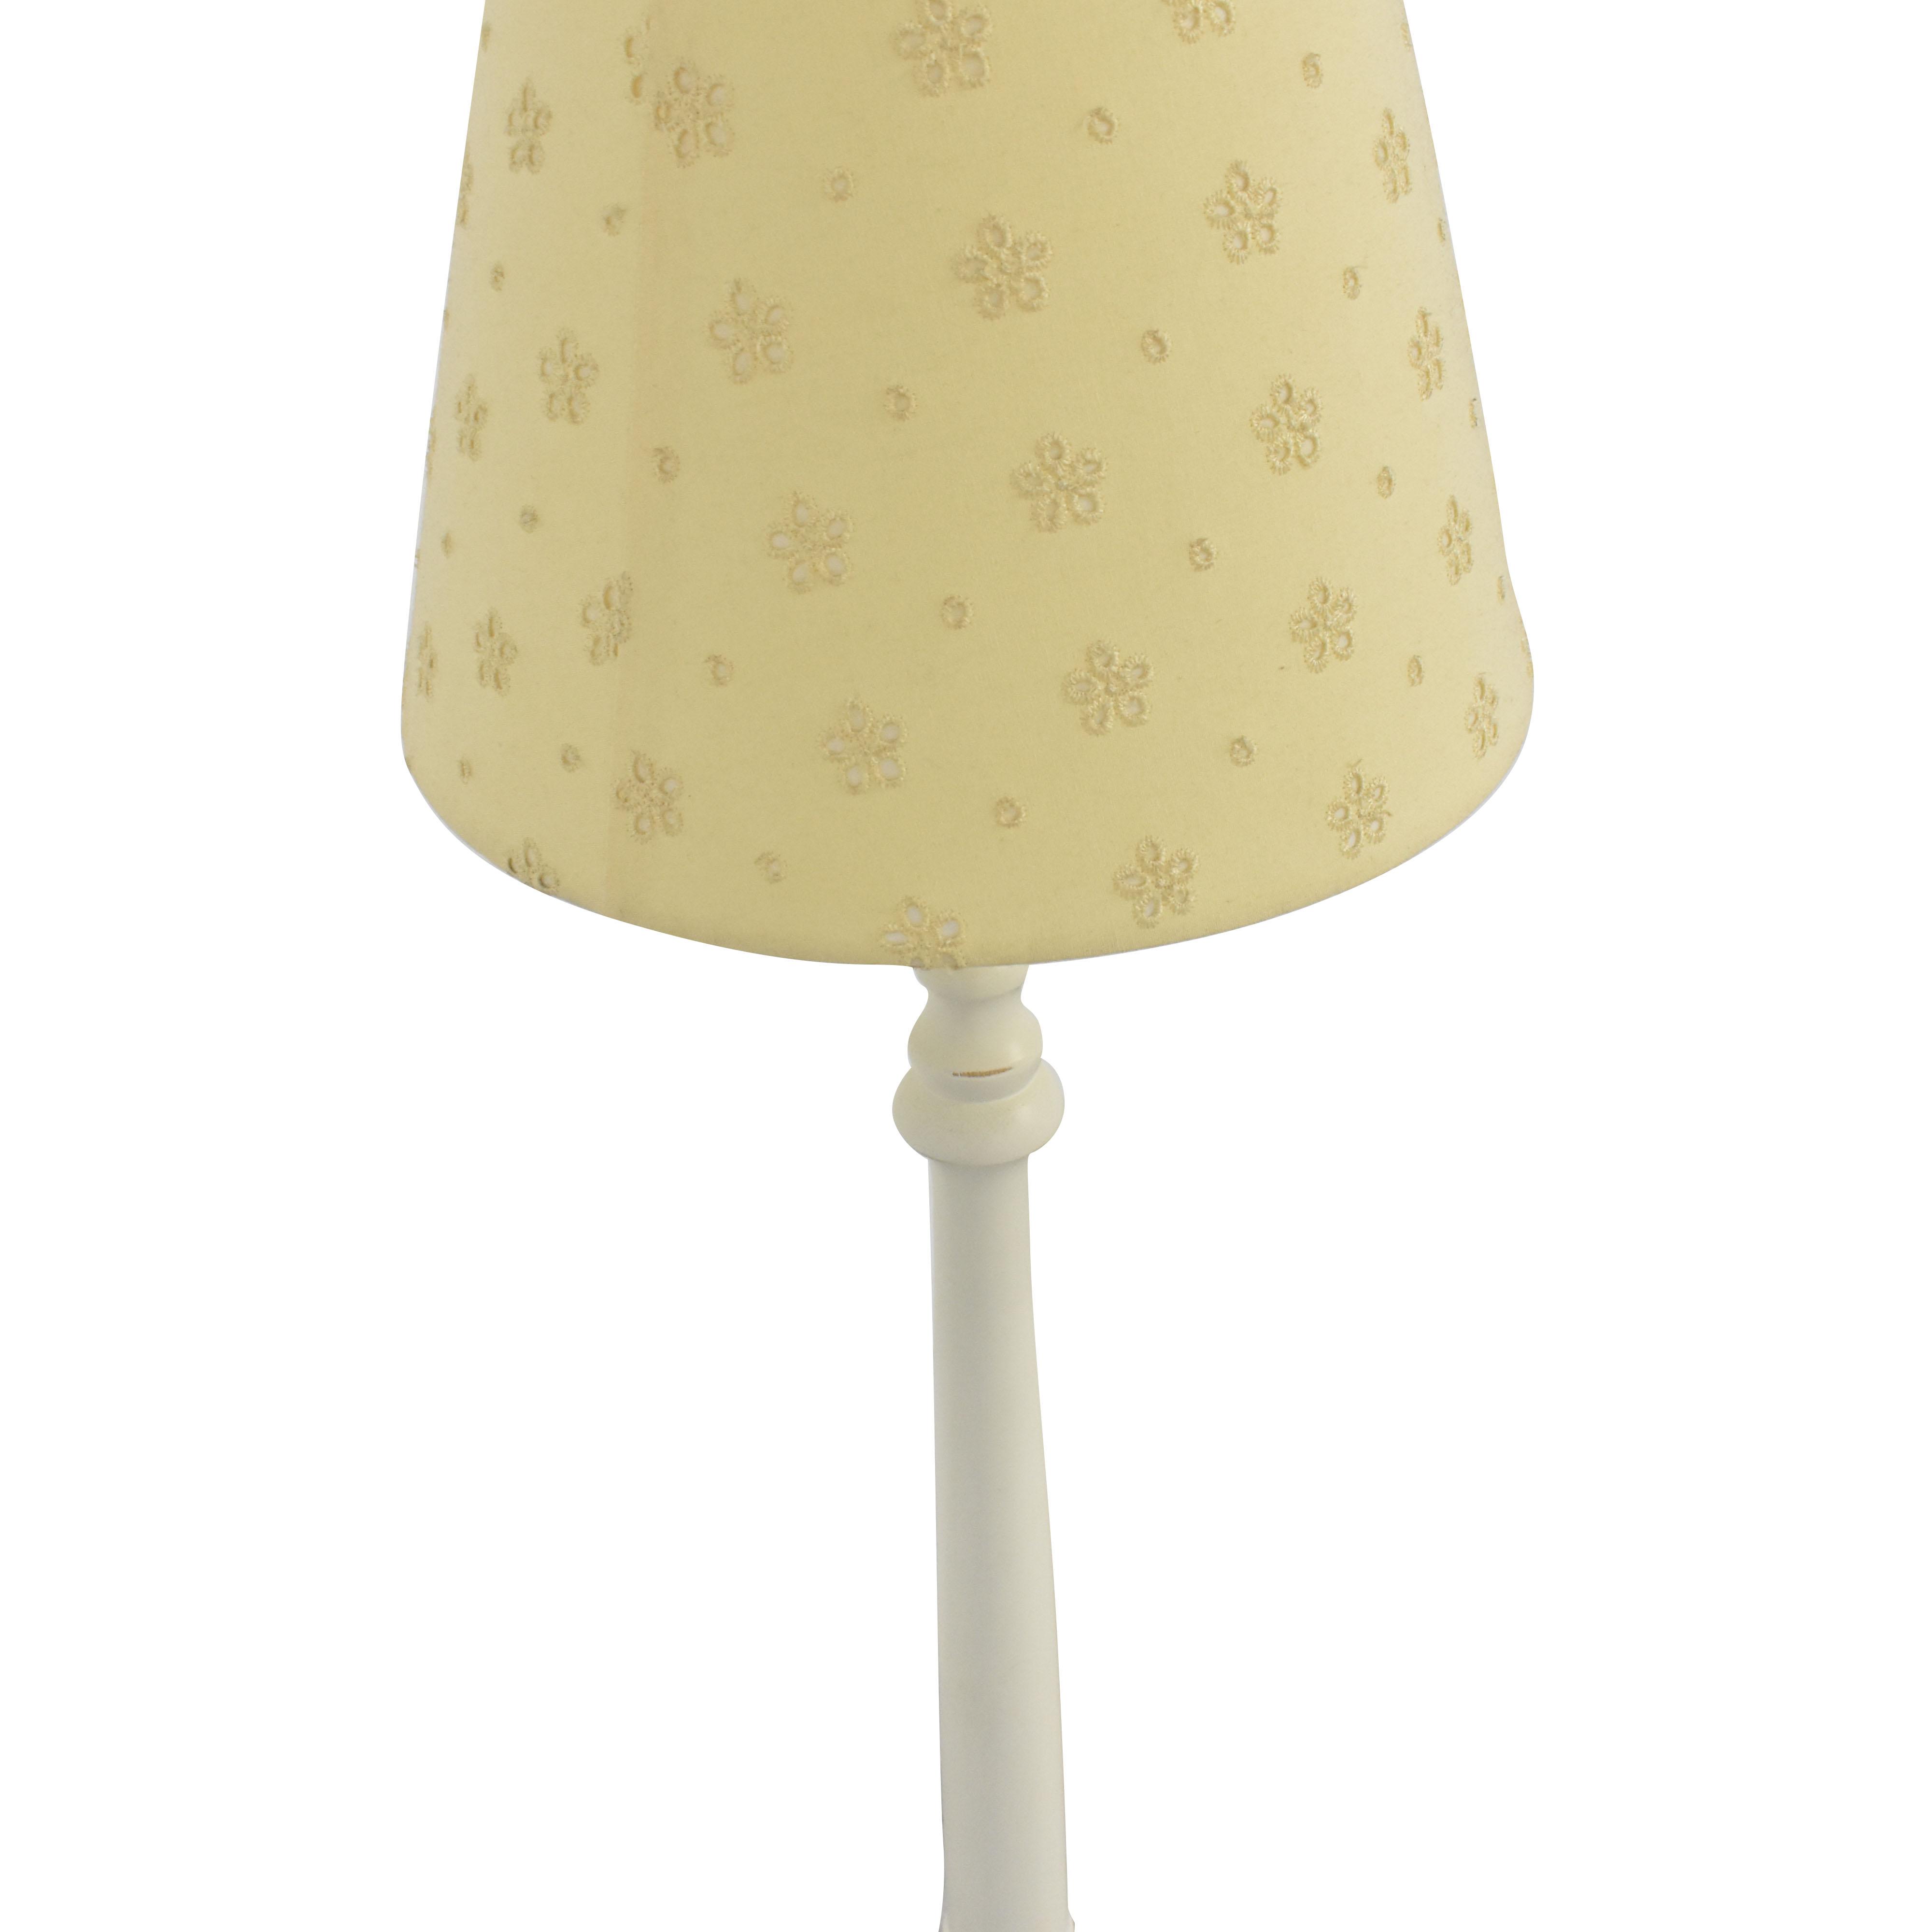 buy Pottery Barn Floor Lamp Pottery Barn Lamps